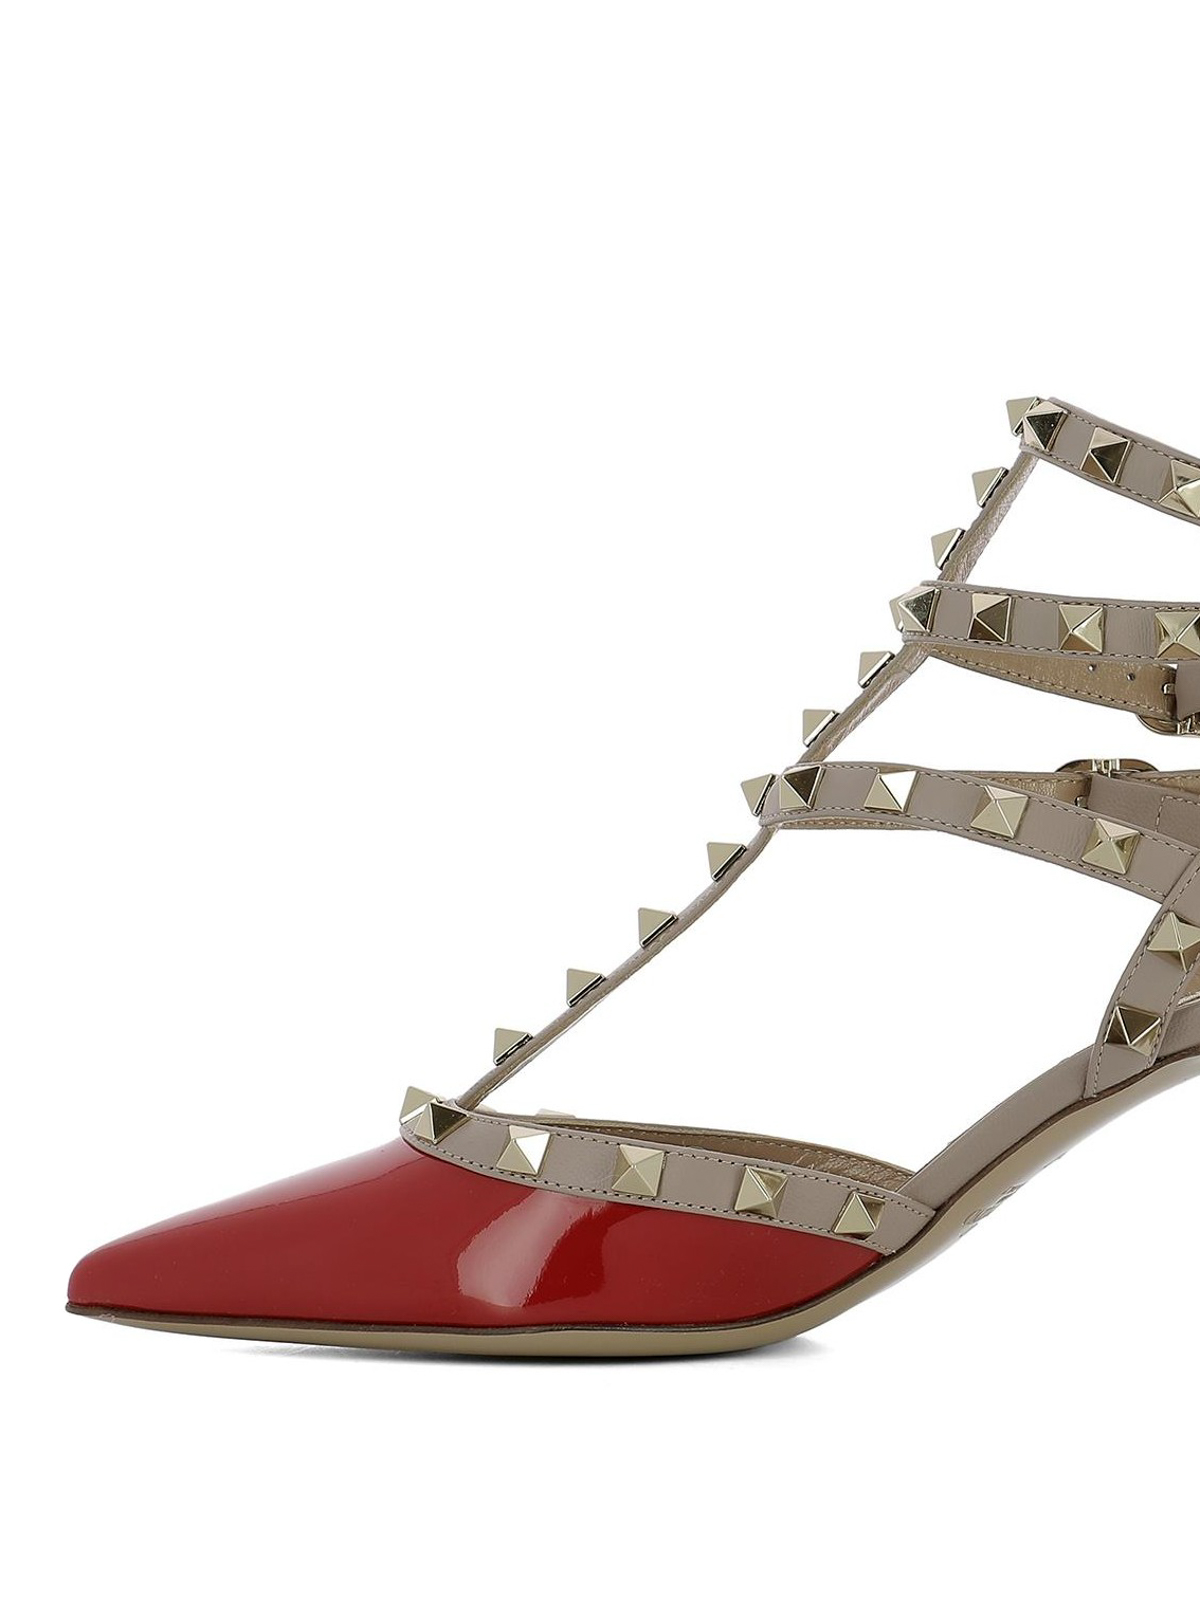 ab0b2c1fbfd iKRIX VALENTINO GARAVANI  court shoes - Rockstud red patent leather sandals